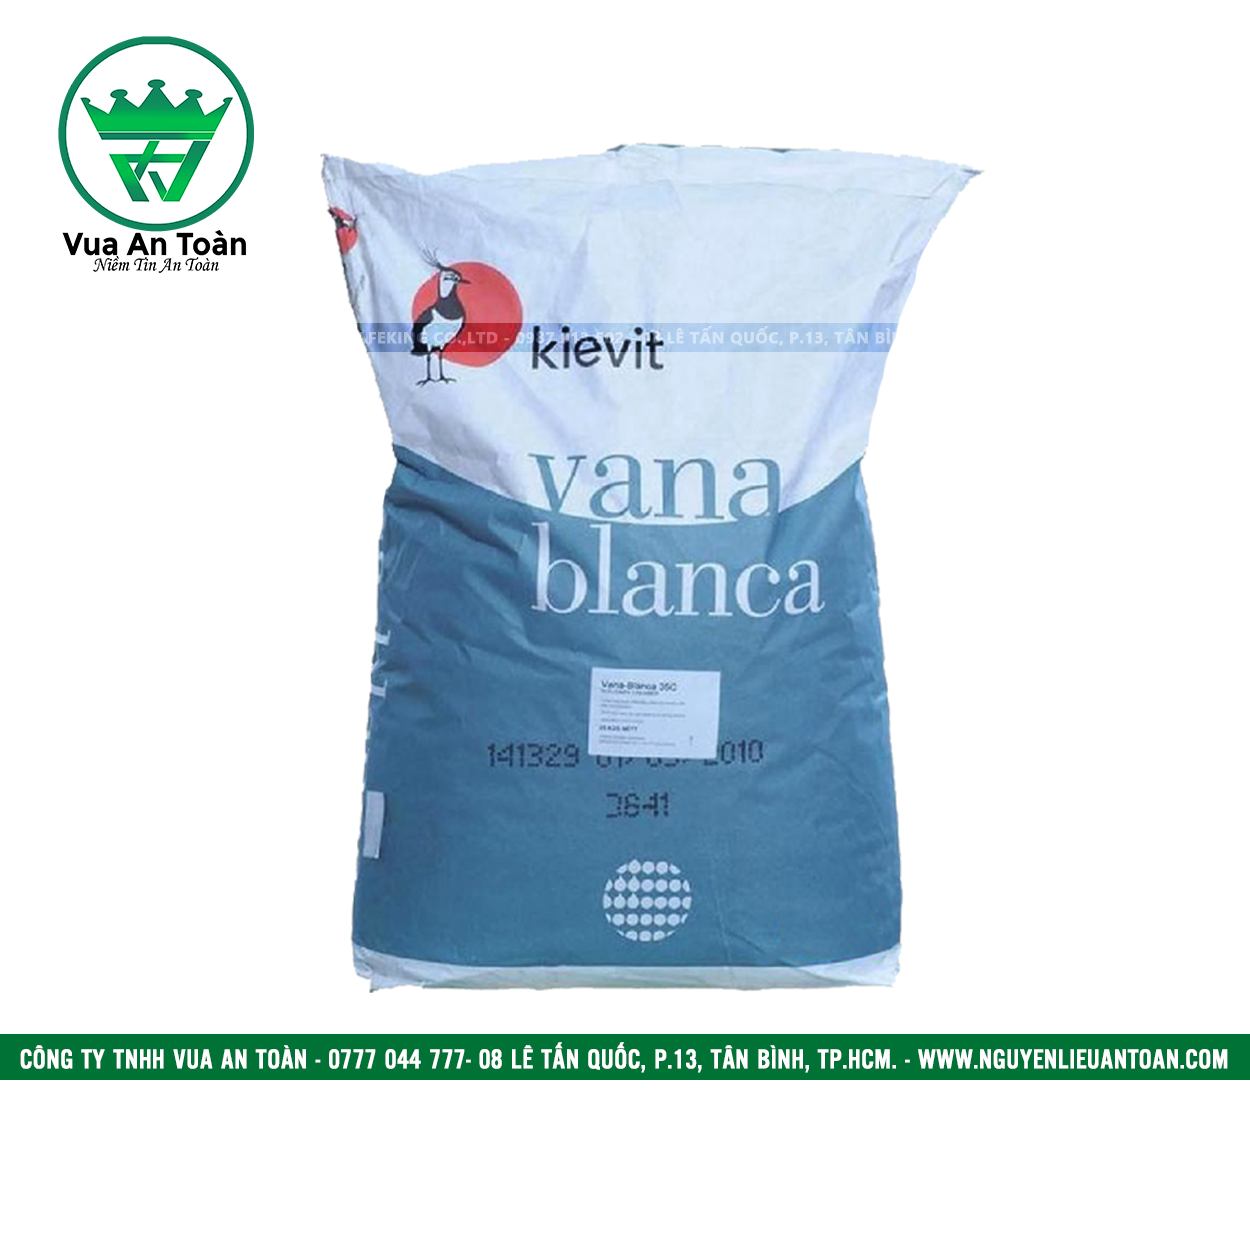 Bột Sữa Kievit (Vana Blanca) – Indonesia 25kg